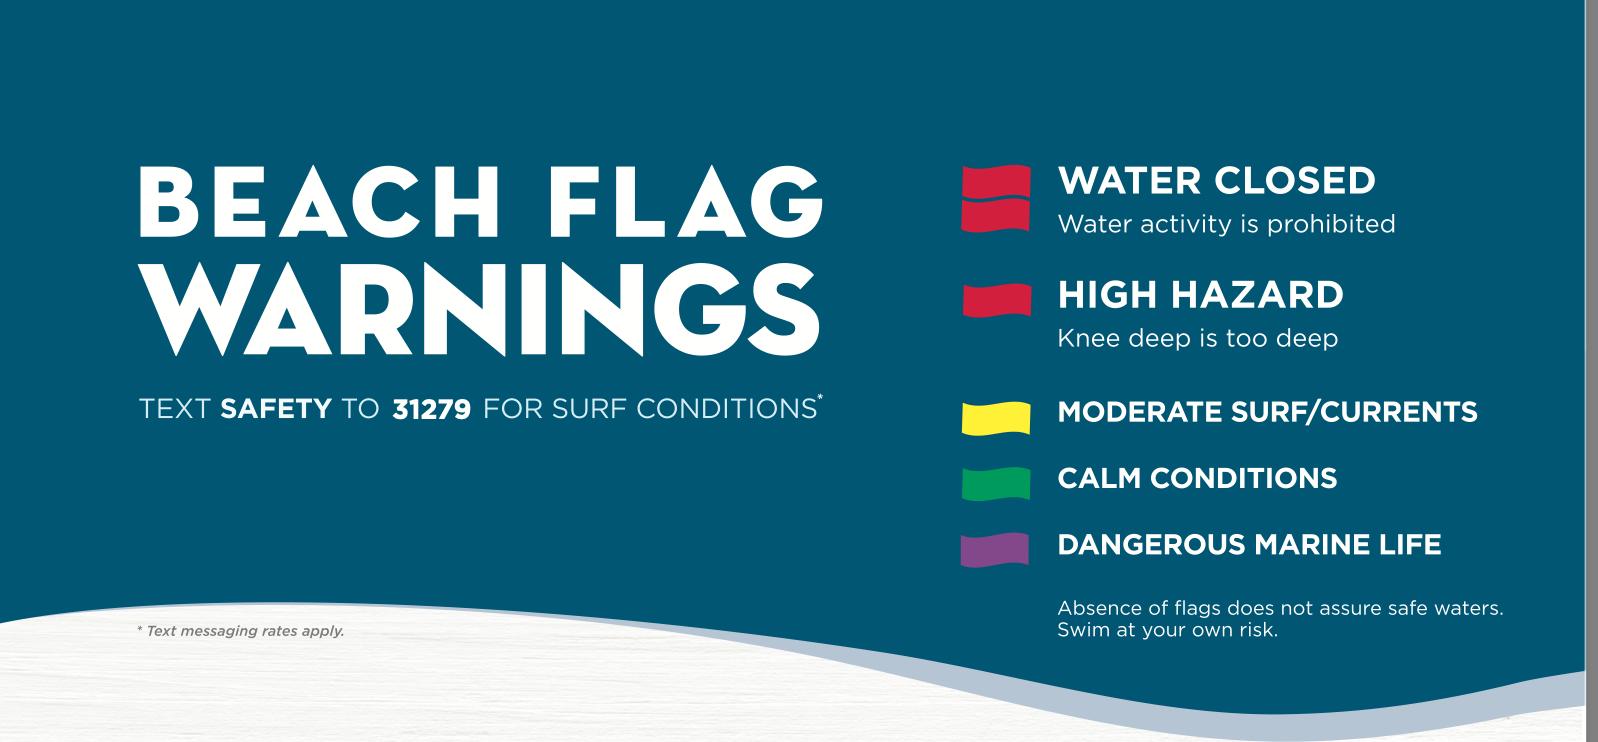 Beach flag warnings